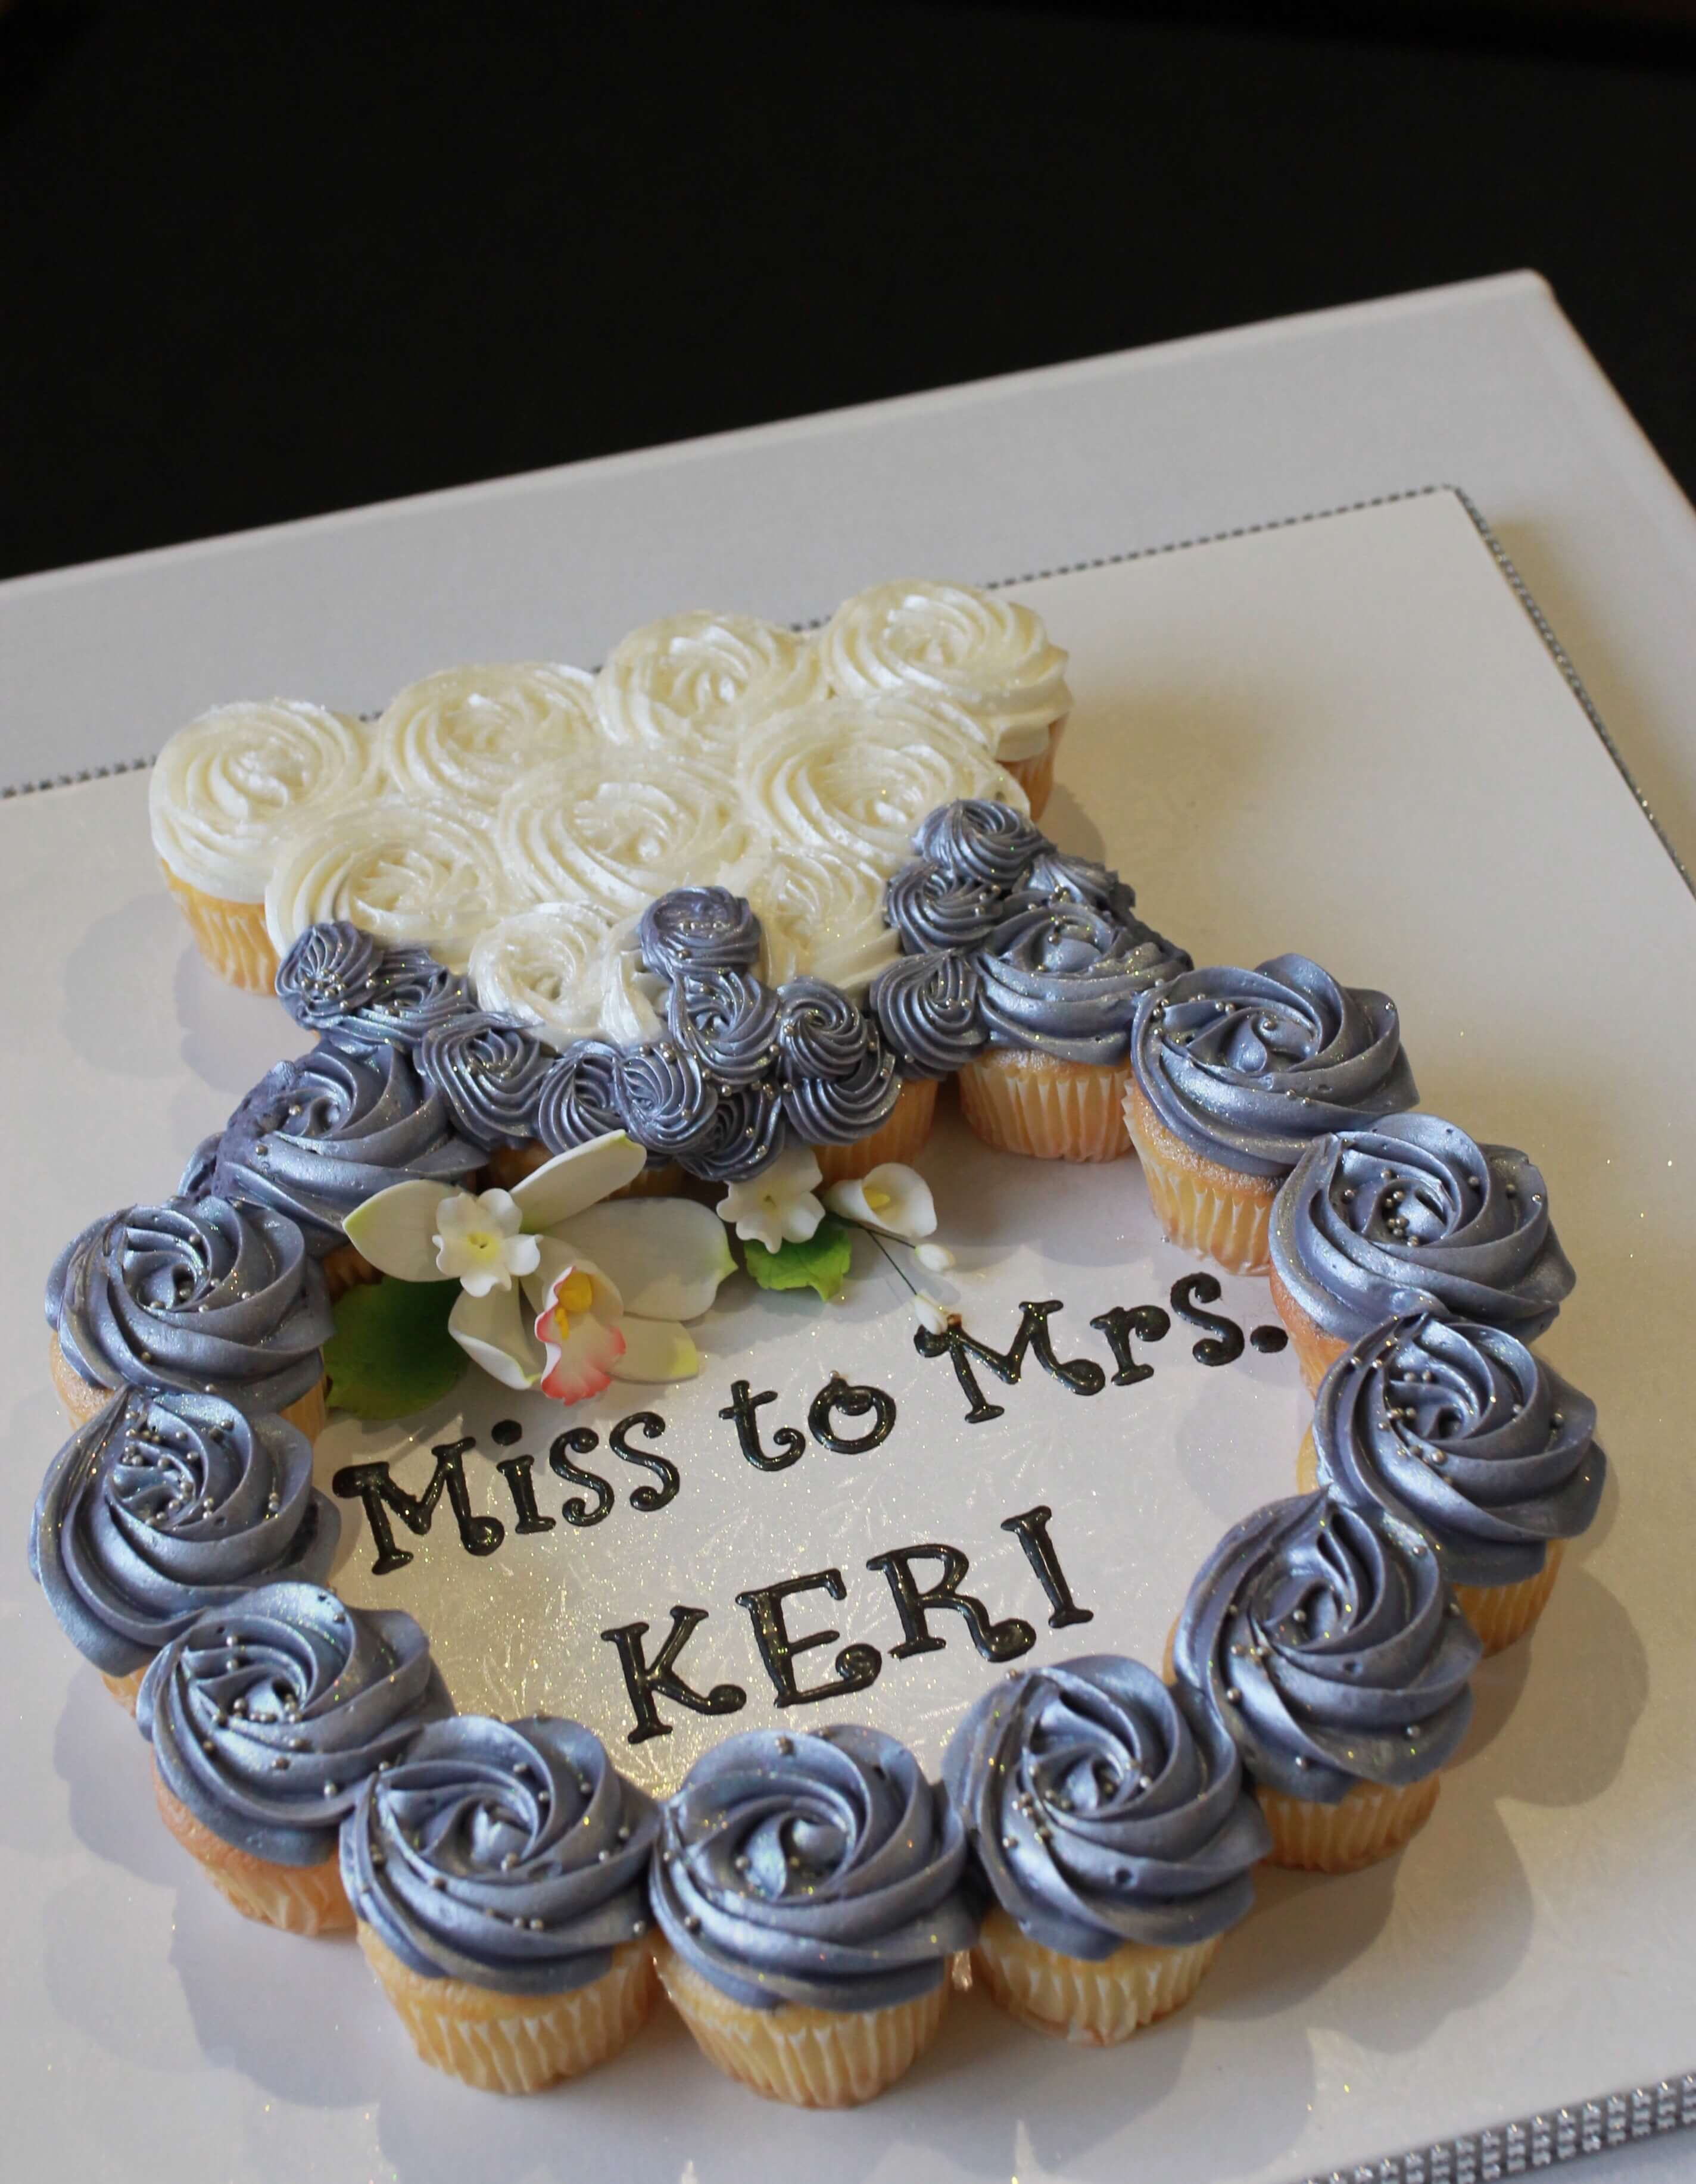 wood drink stirrers bridal shower engagement ring cupcake bridal shower dessert idea cake miss to mrs